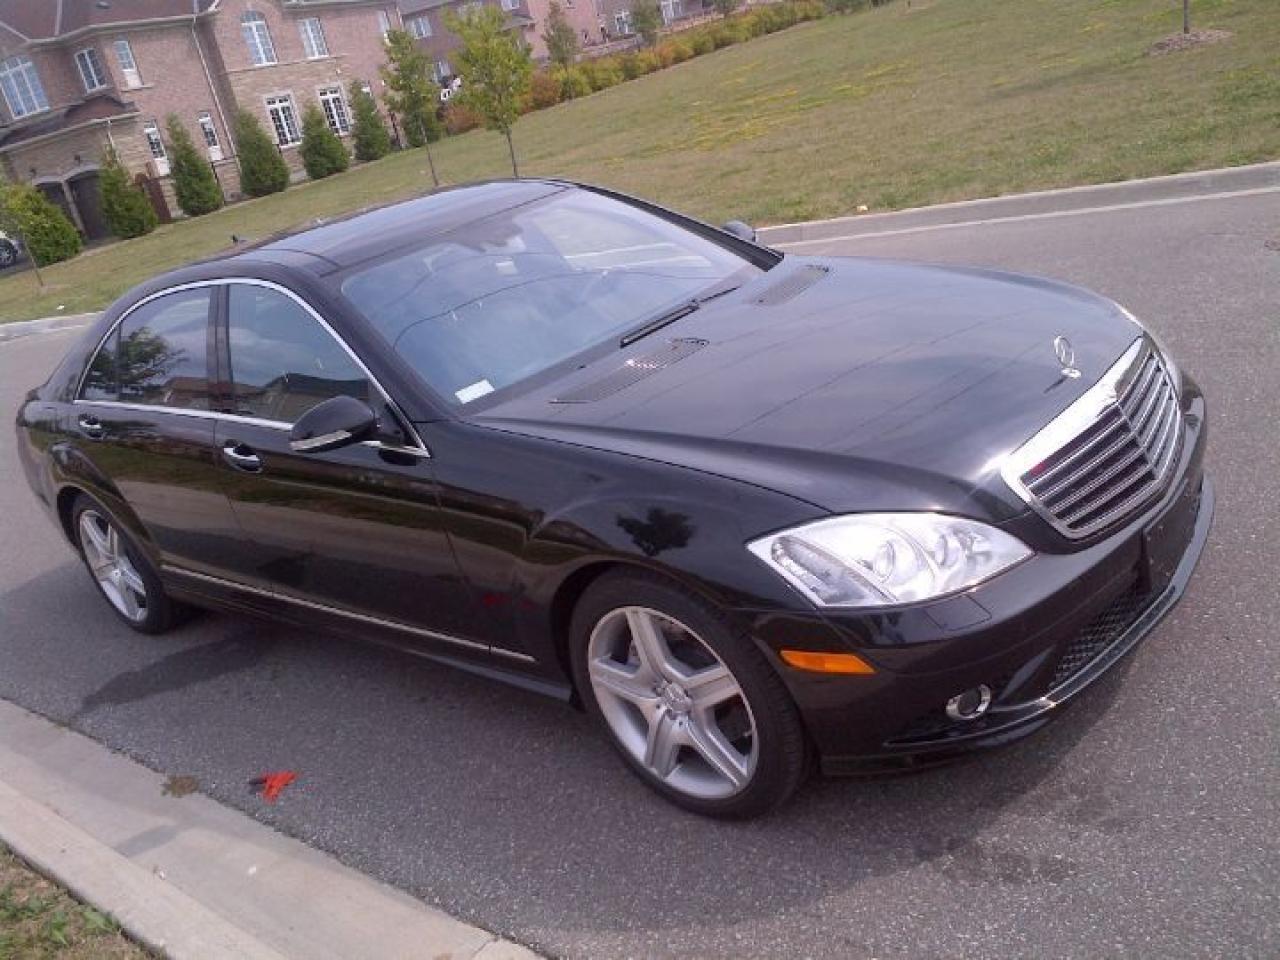 Photo of Black 2009 Mercedes-Benz S550 4MATIC